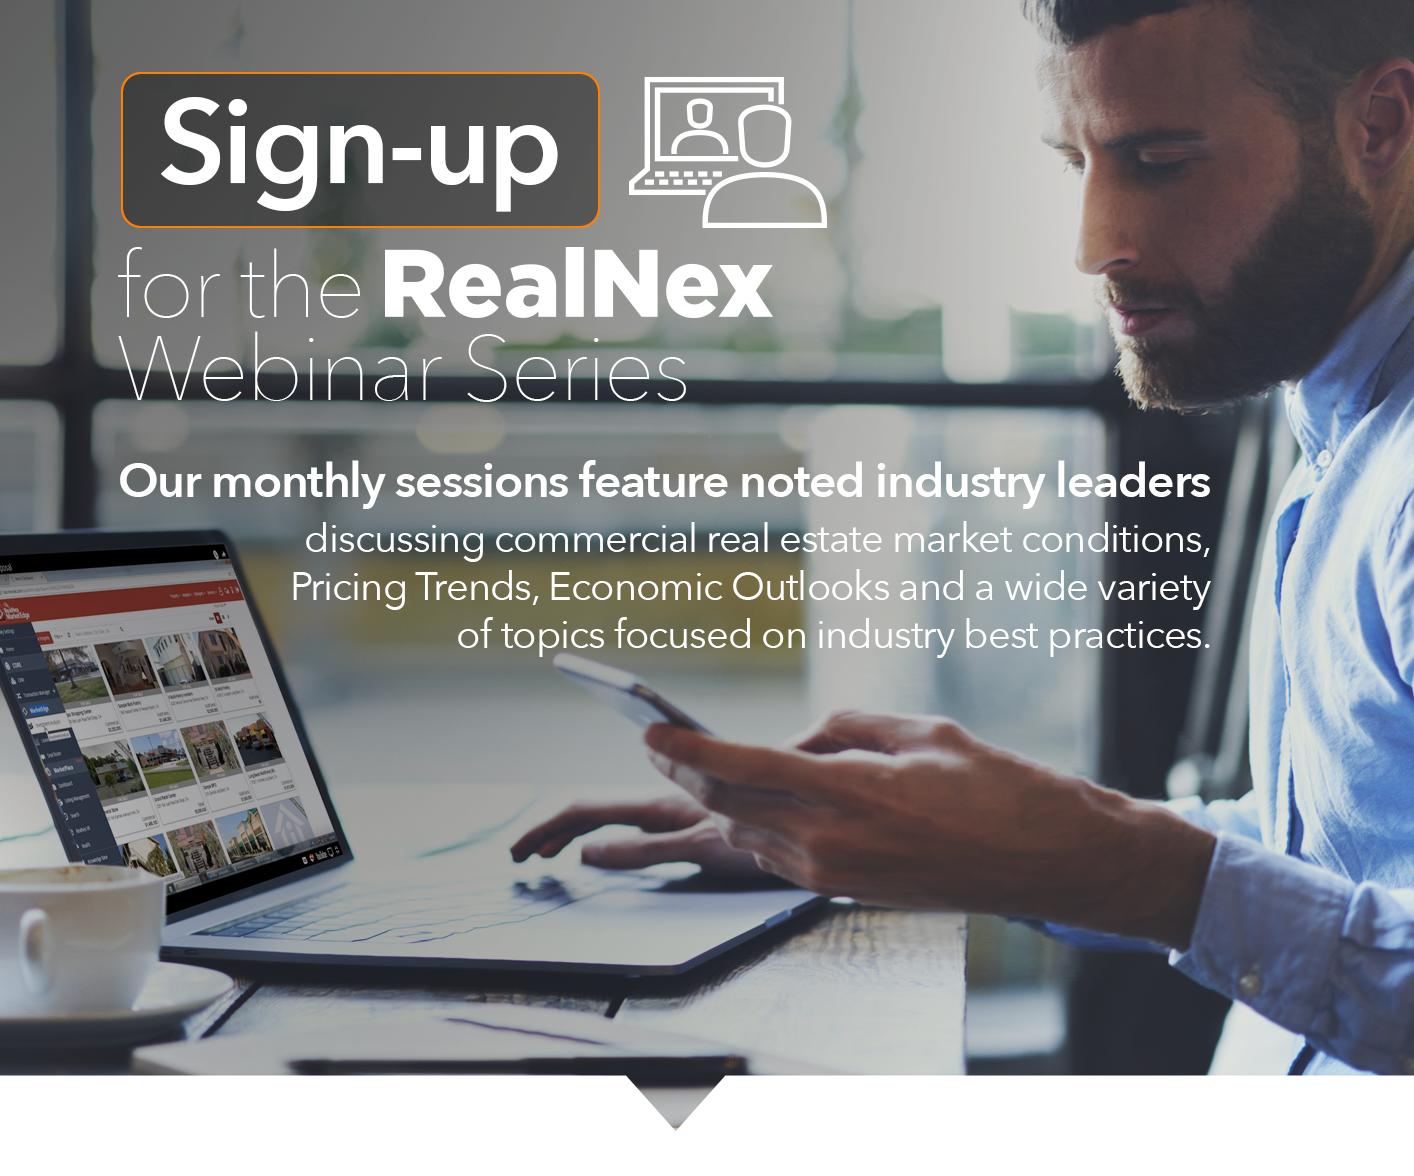 rnx-webinarseries-sidebar